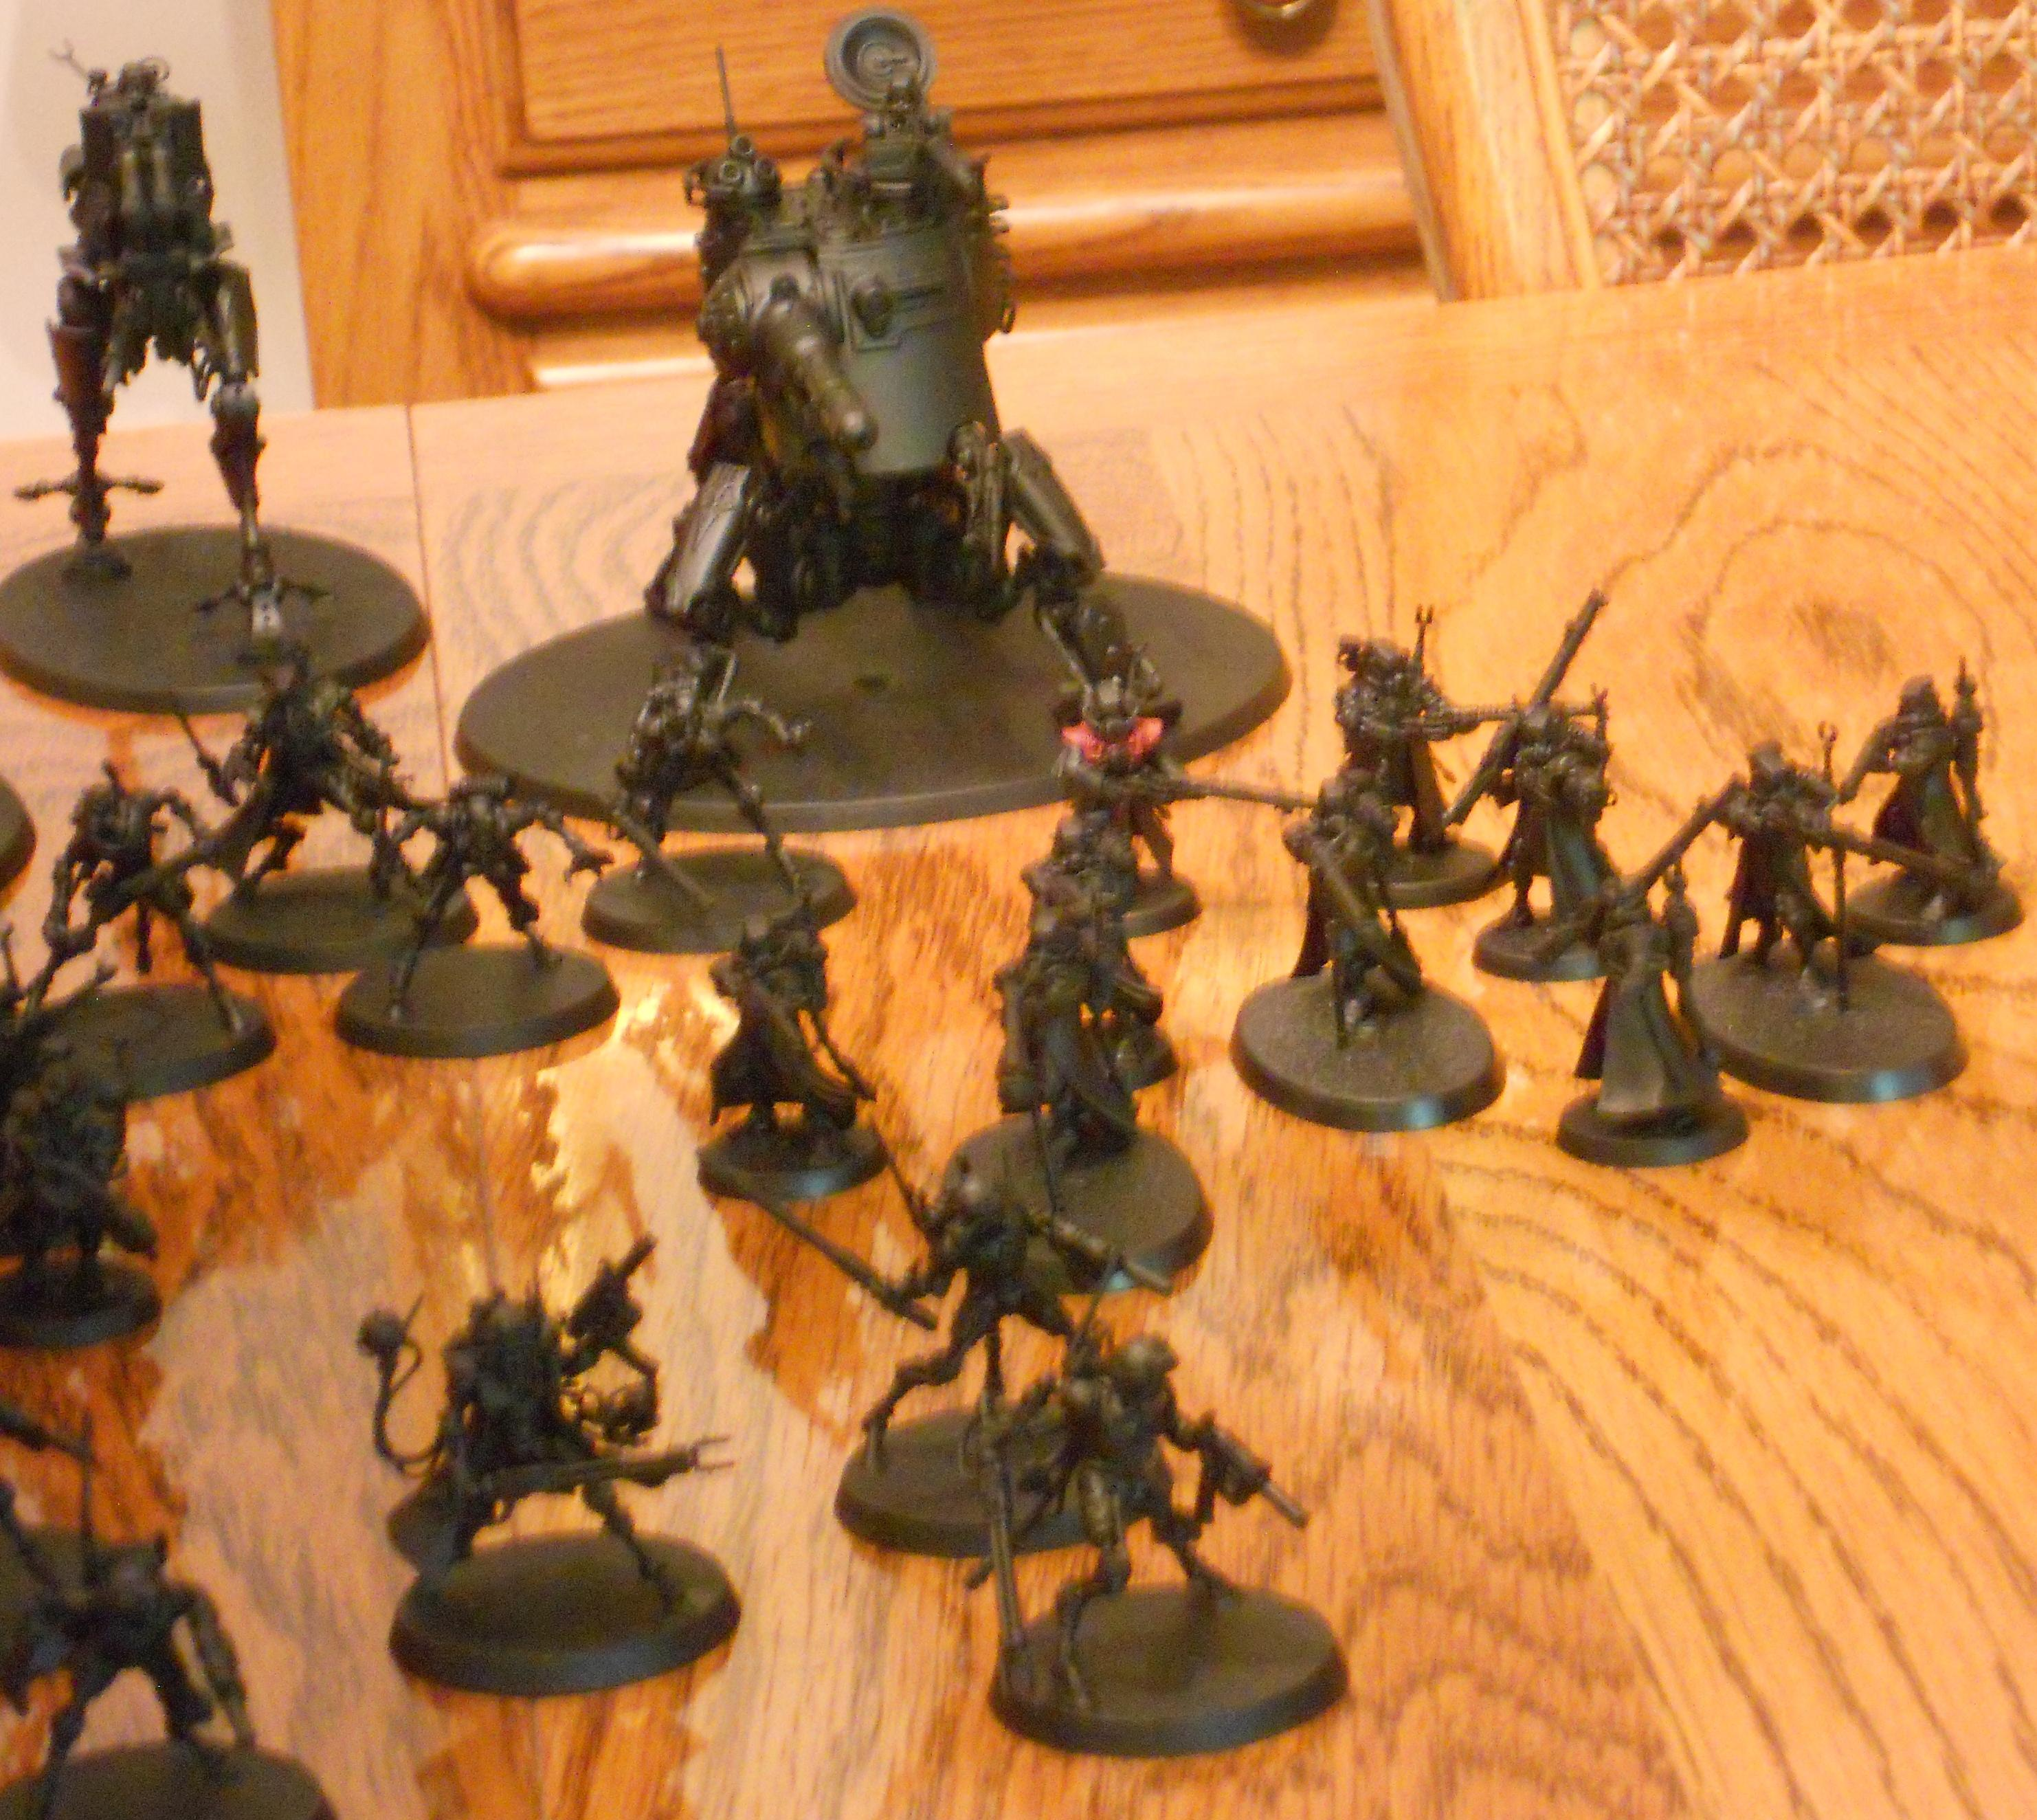 Infiltrators, Ruststalkers, Rangers, Onager, and Ironstrider